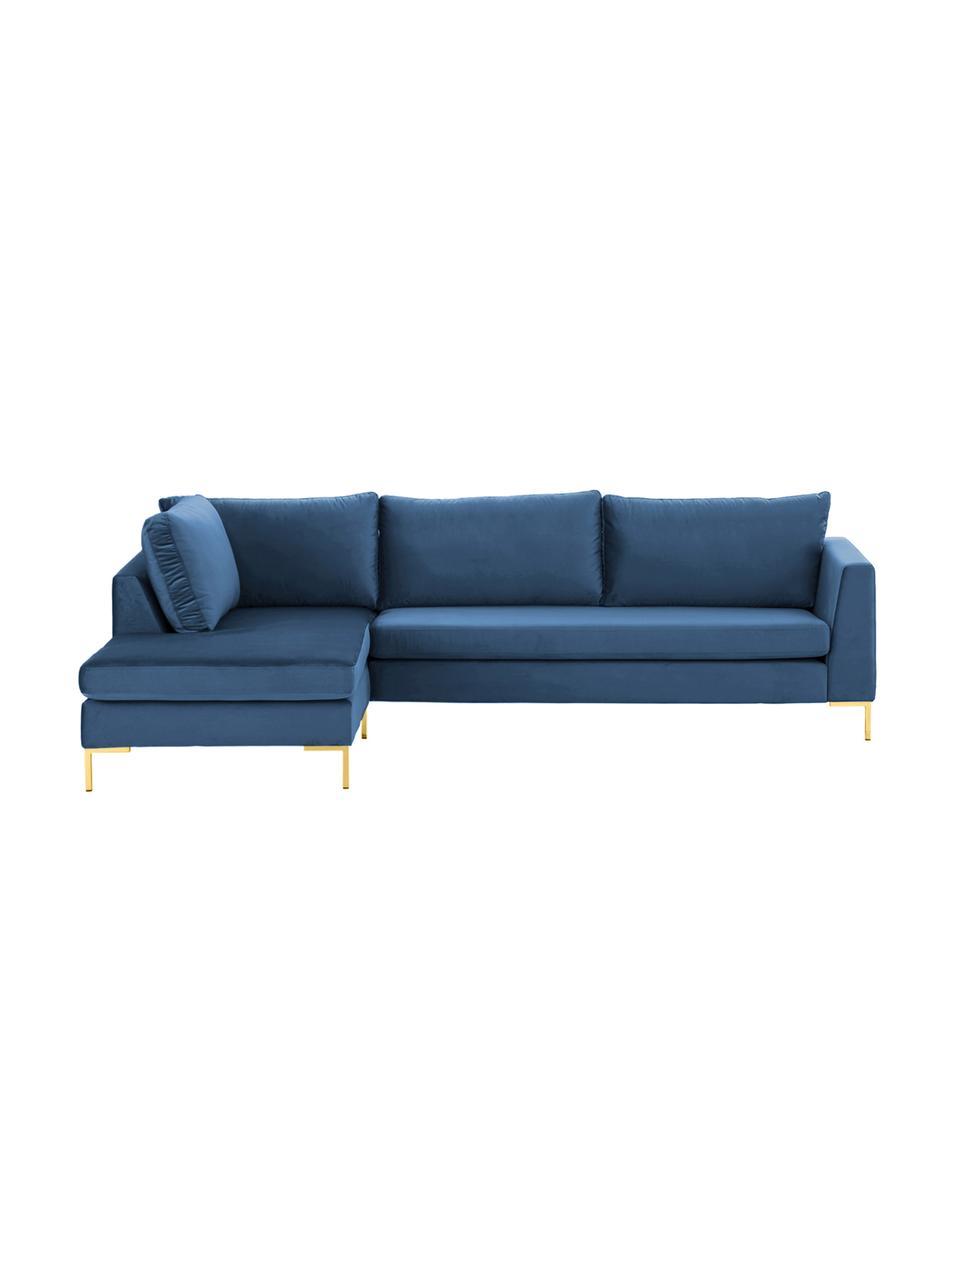 Canapé d'angle velours bleu Luna, Velours bleu, or